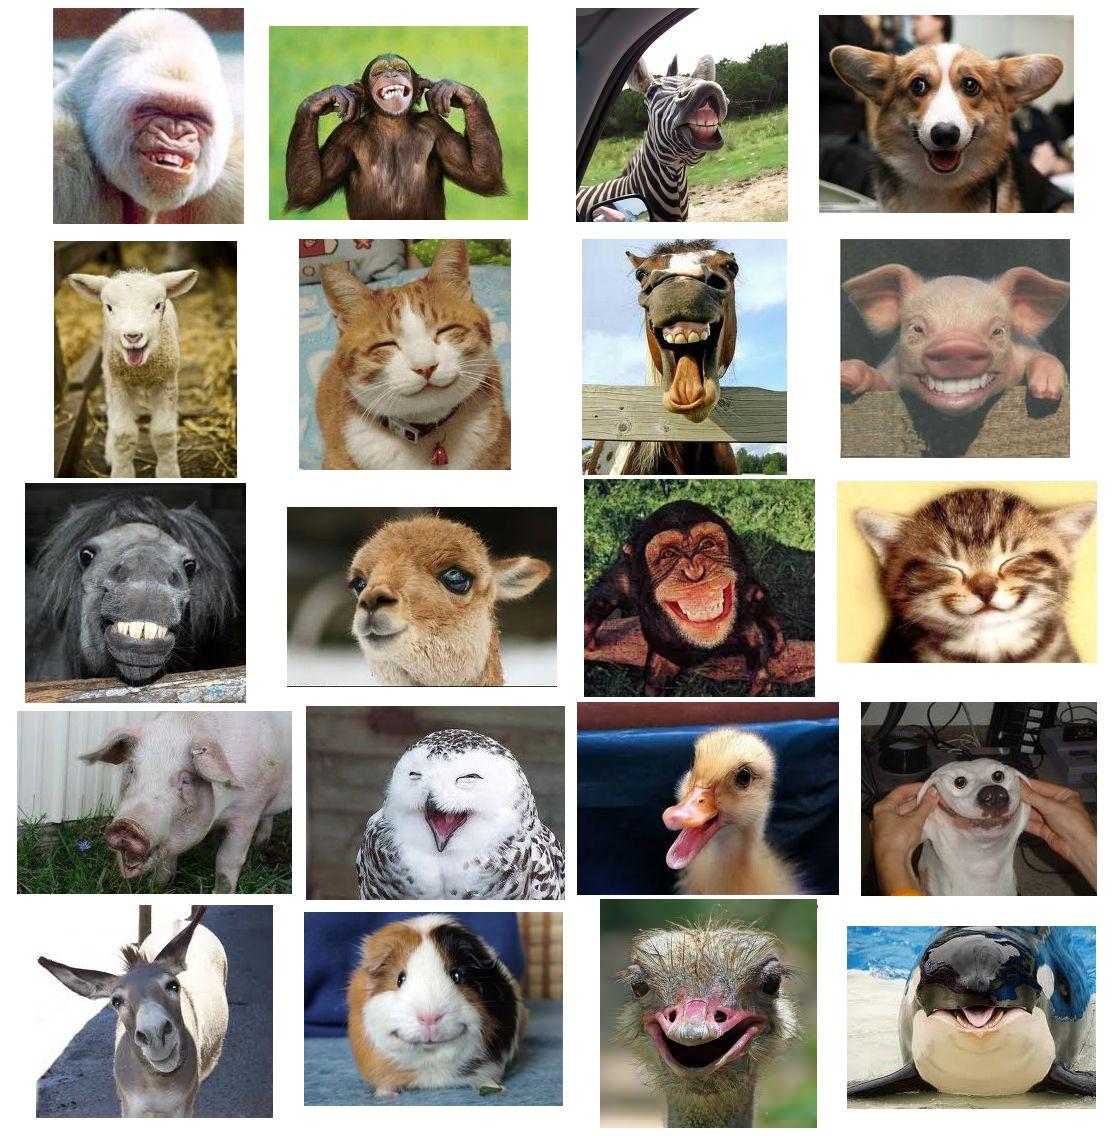 animalsmile.jpg